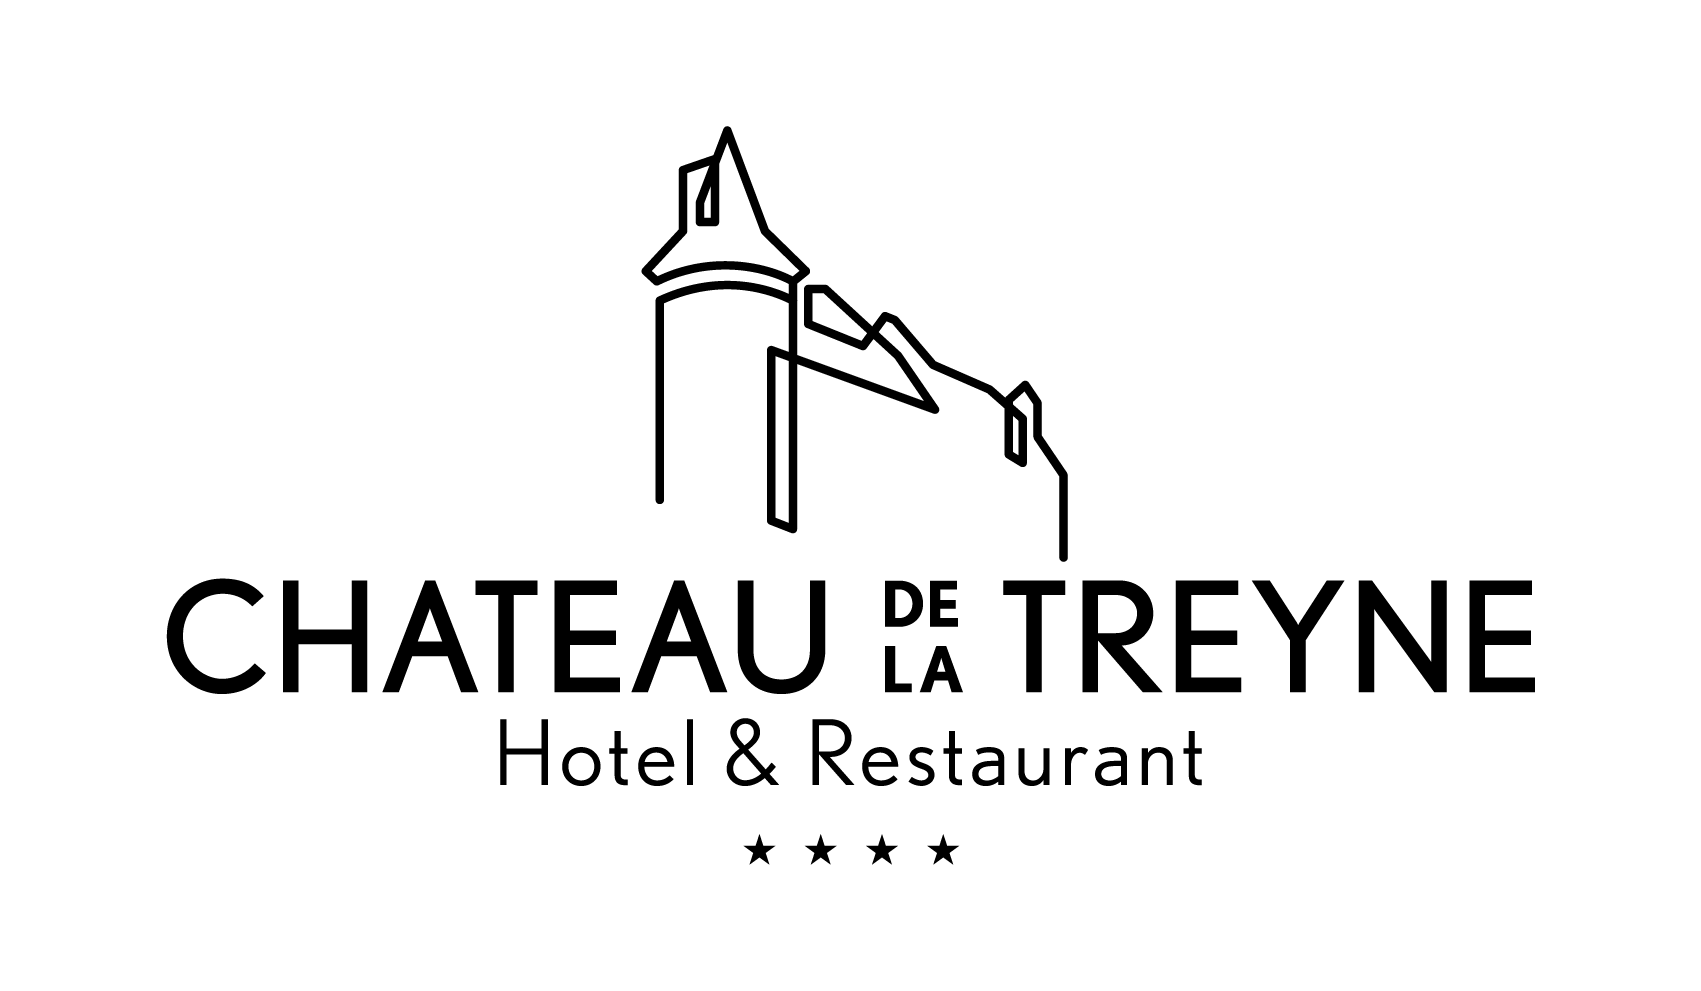 EXE_logo_chateau_de_la_treyne_Plan de travail 1 copie 2